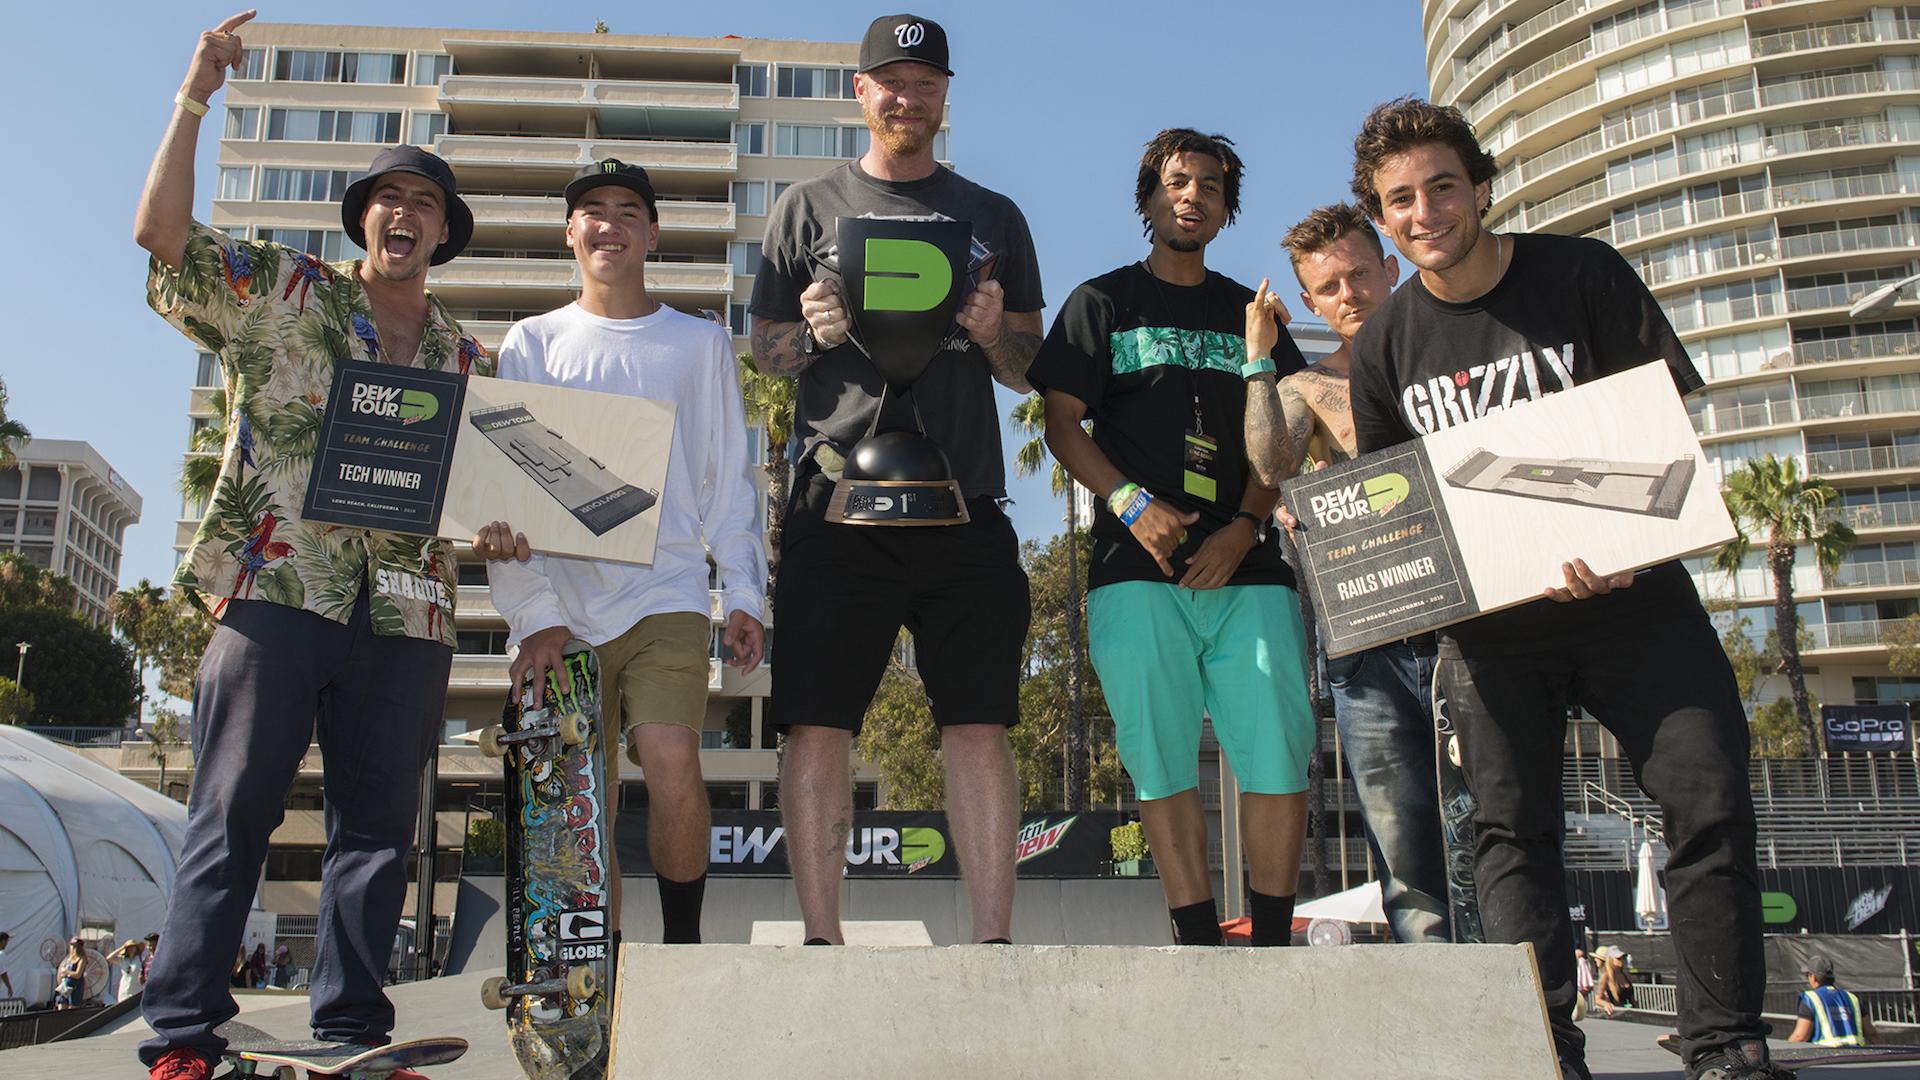 Blind skateboards team win dew tour challenge tj rogers trey wood bill weiss kevin romar cody mcentire micky papa